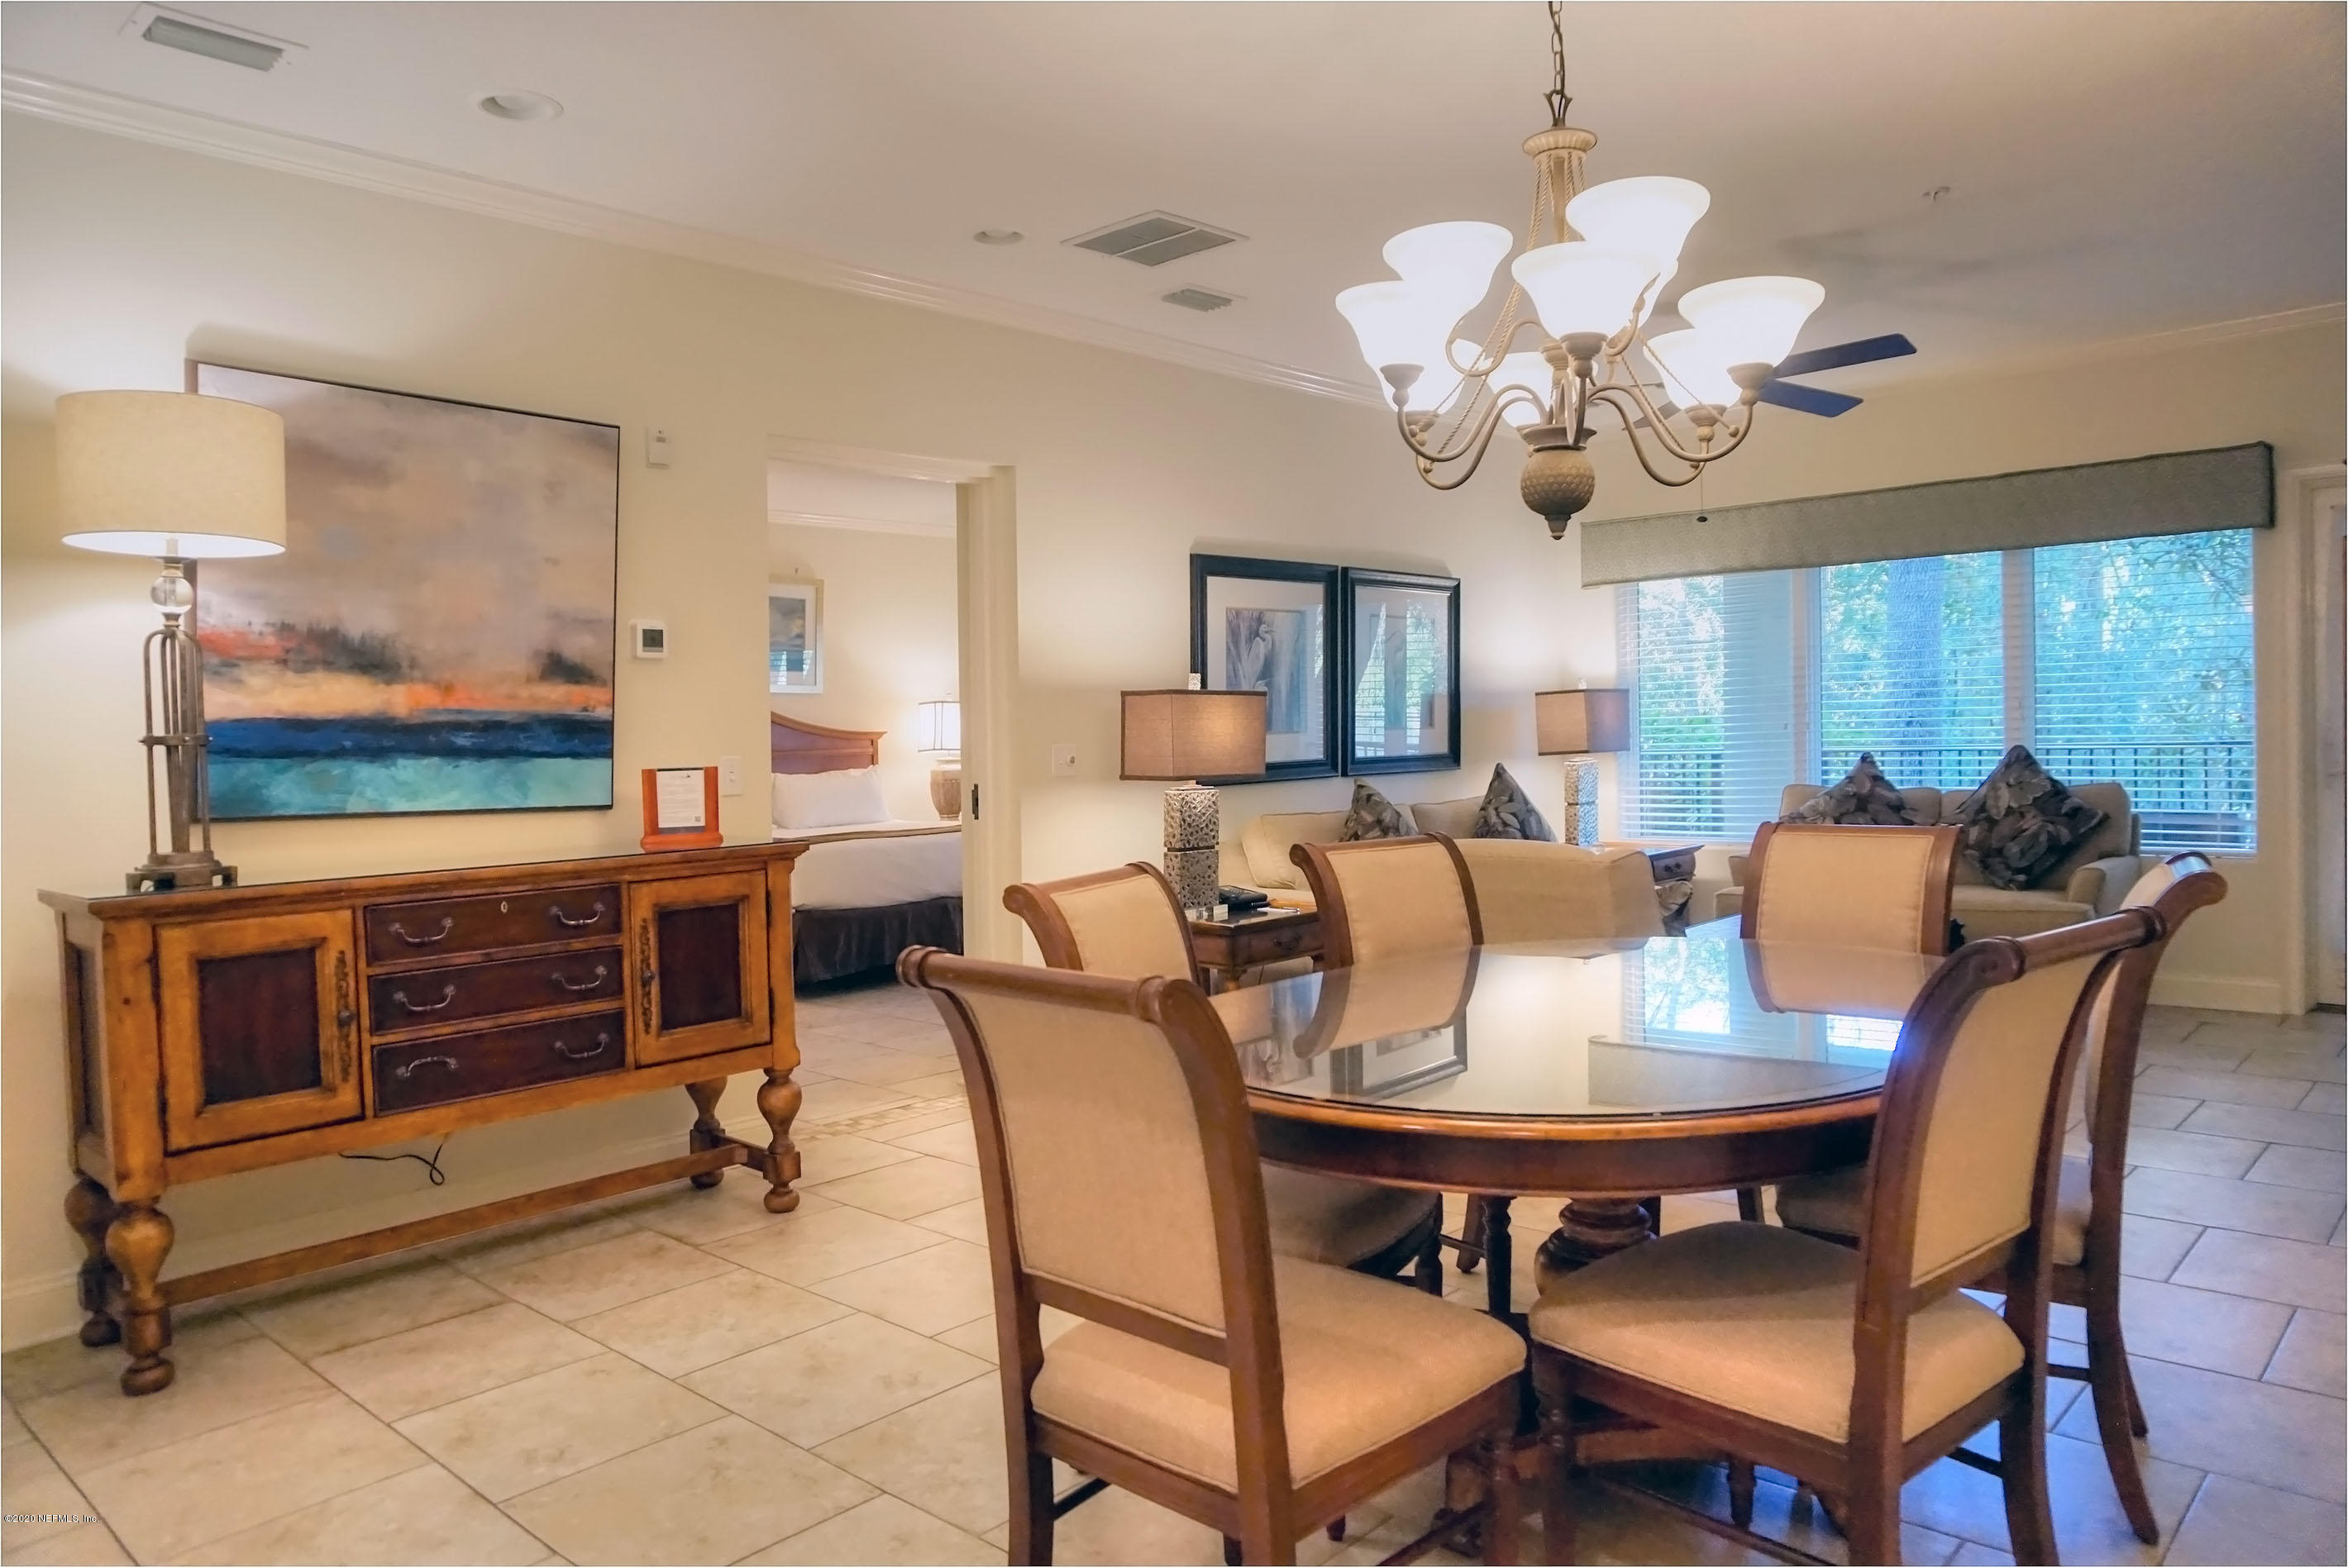 2509/2510 BOXWOOD, FERNANDINA BEACH, FLORIDA 32034, 2 Bedrooms Bedrooms, ,2 BathroomsBathrooms,Residential,For sale,BOXWOOD,1037253